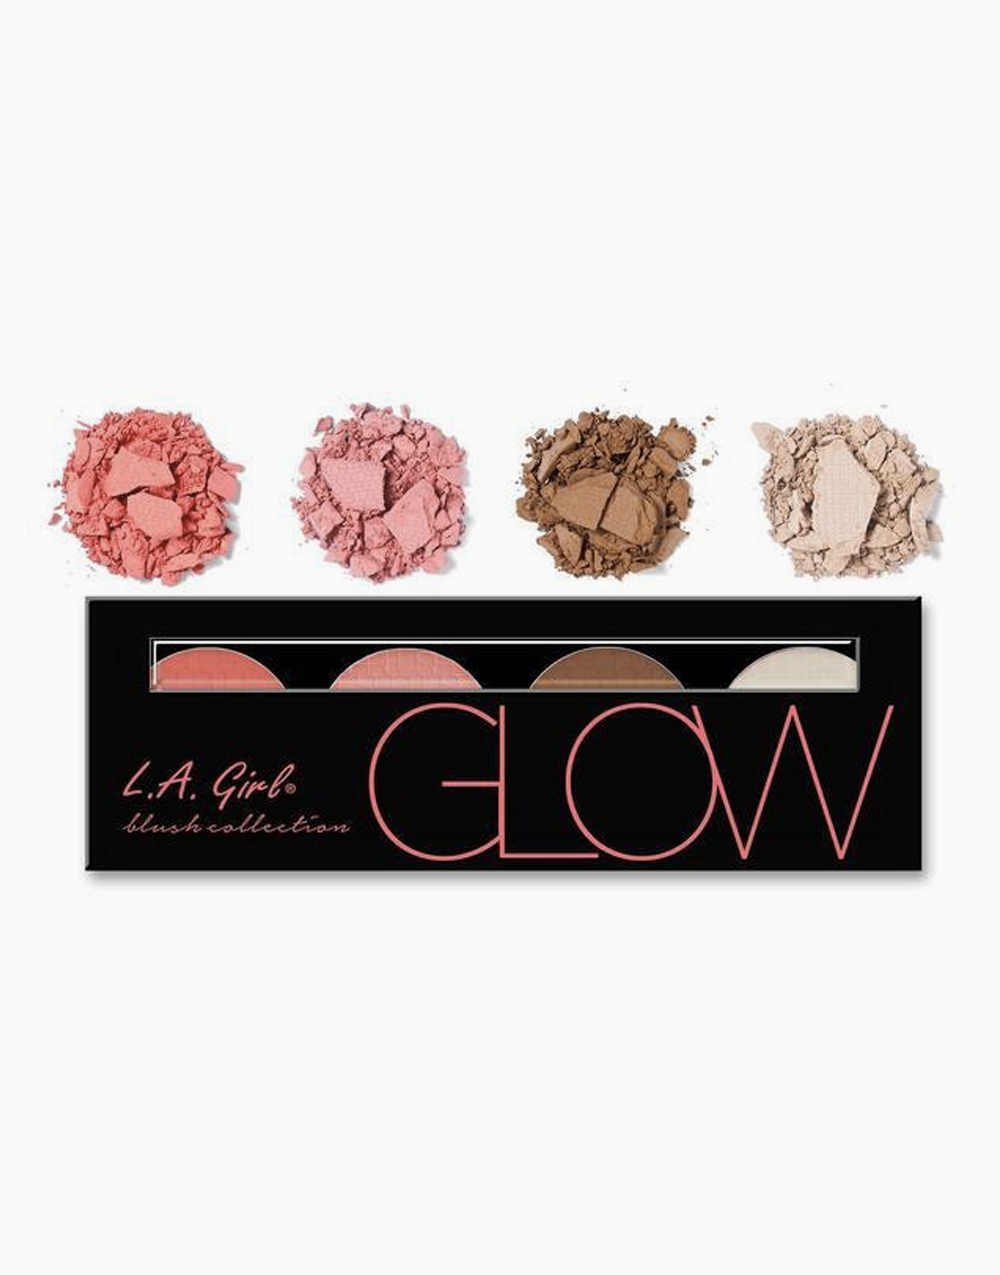 Beauty Brick Blush by L.A. Girl | Glow